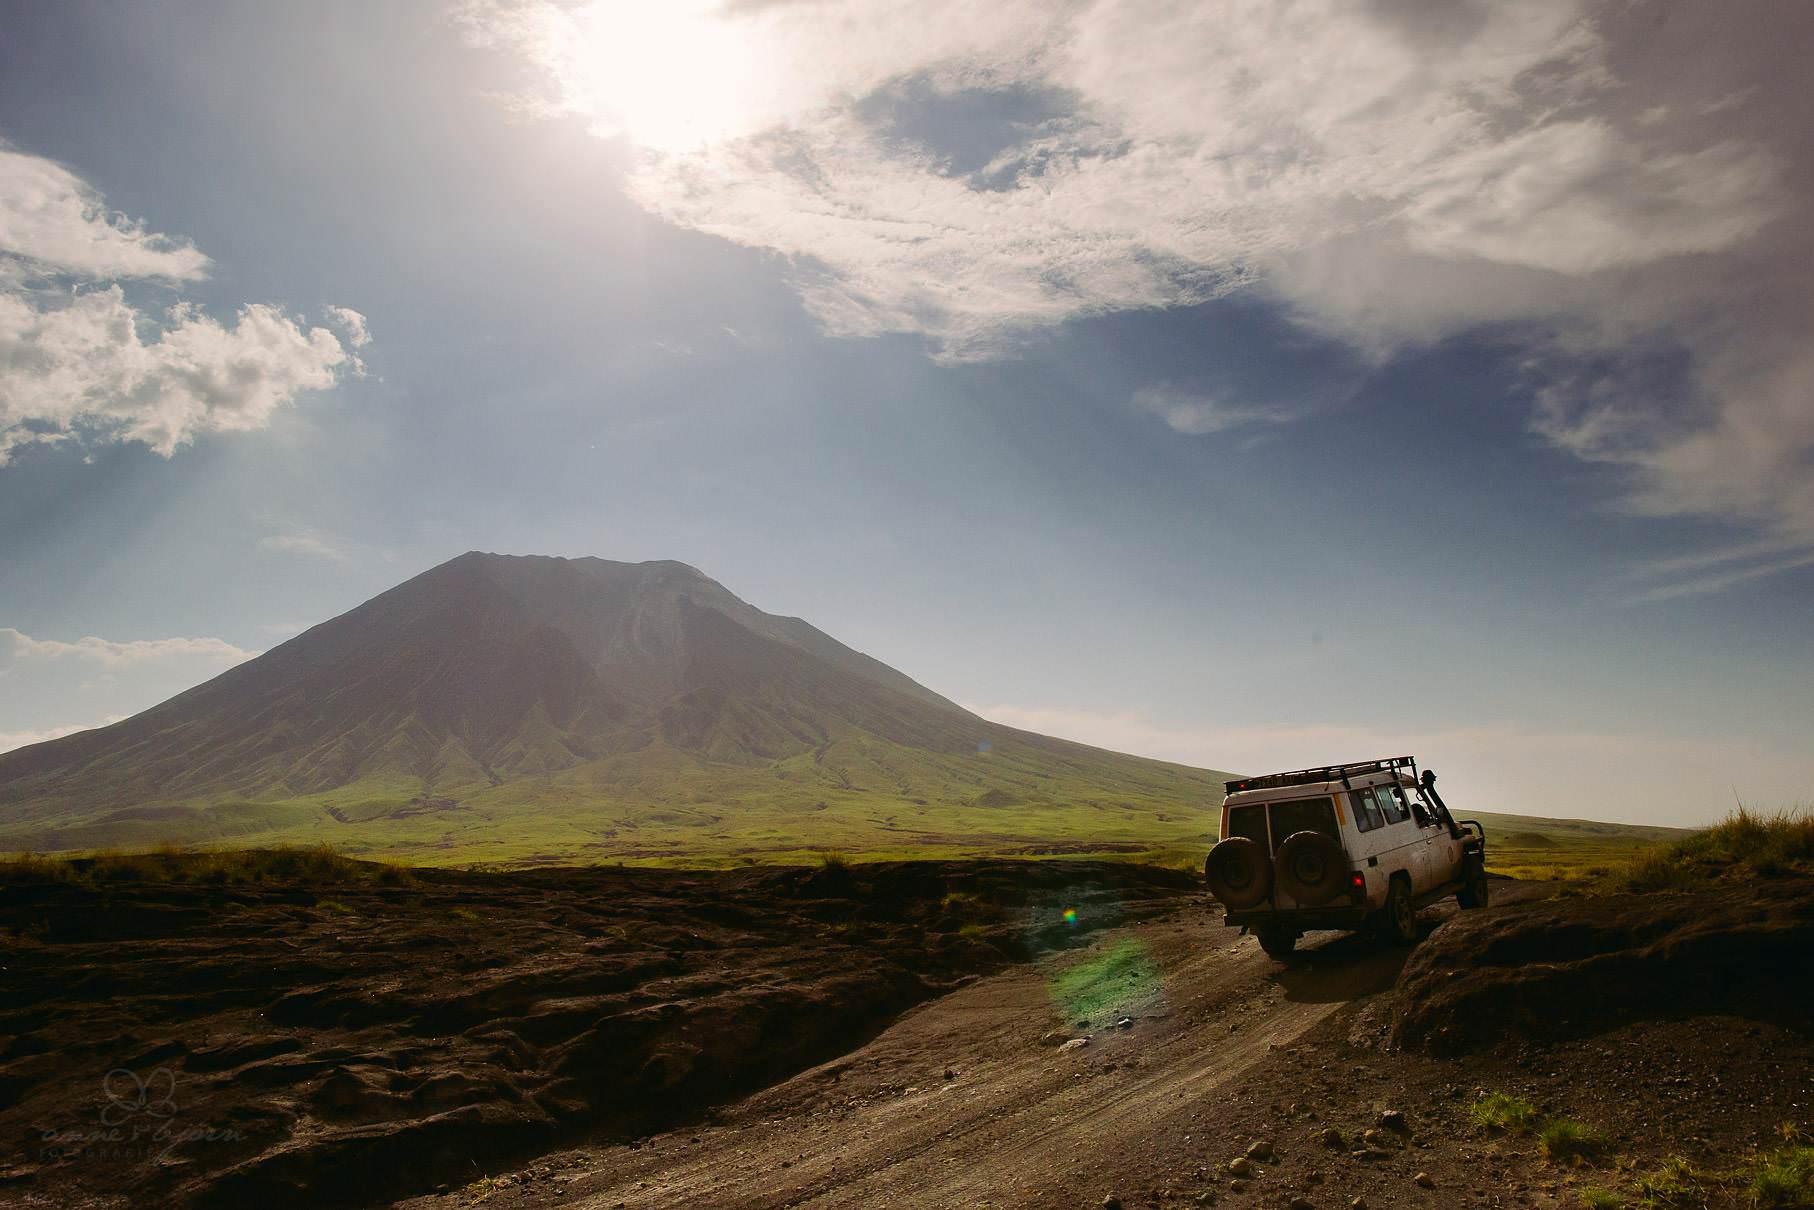 0010 tansania nd8 9634 anne bjoern fotografie hochzeitsfotograf hamburg - This is Tanzania - Serengeti, Kilimanjaro & Sansibar